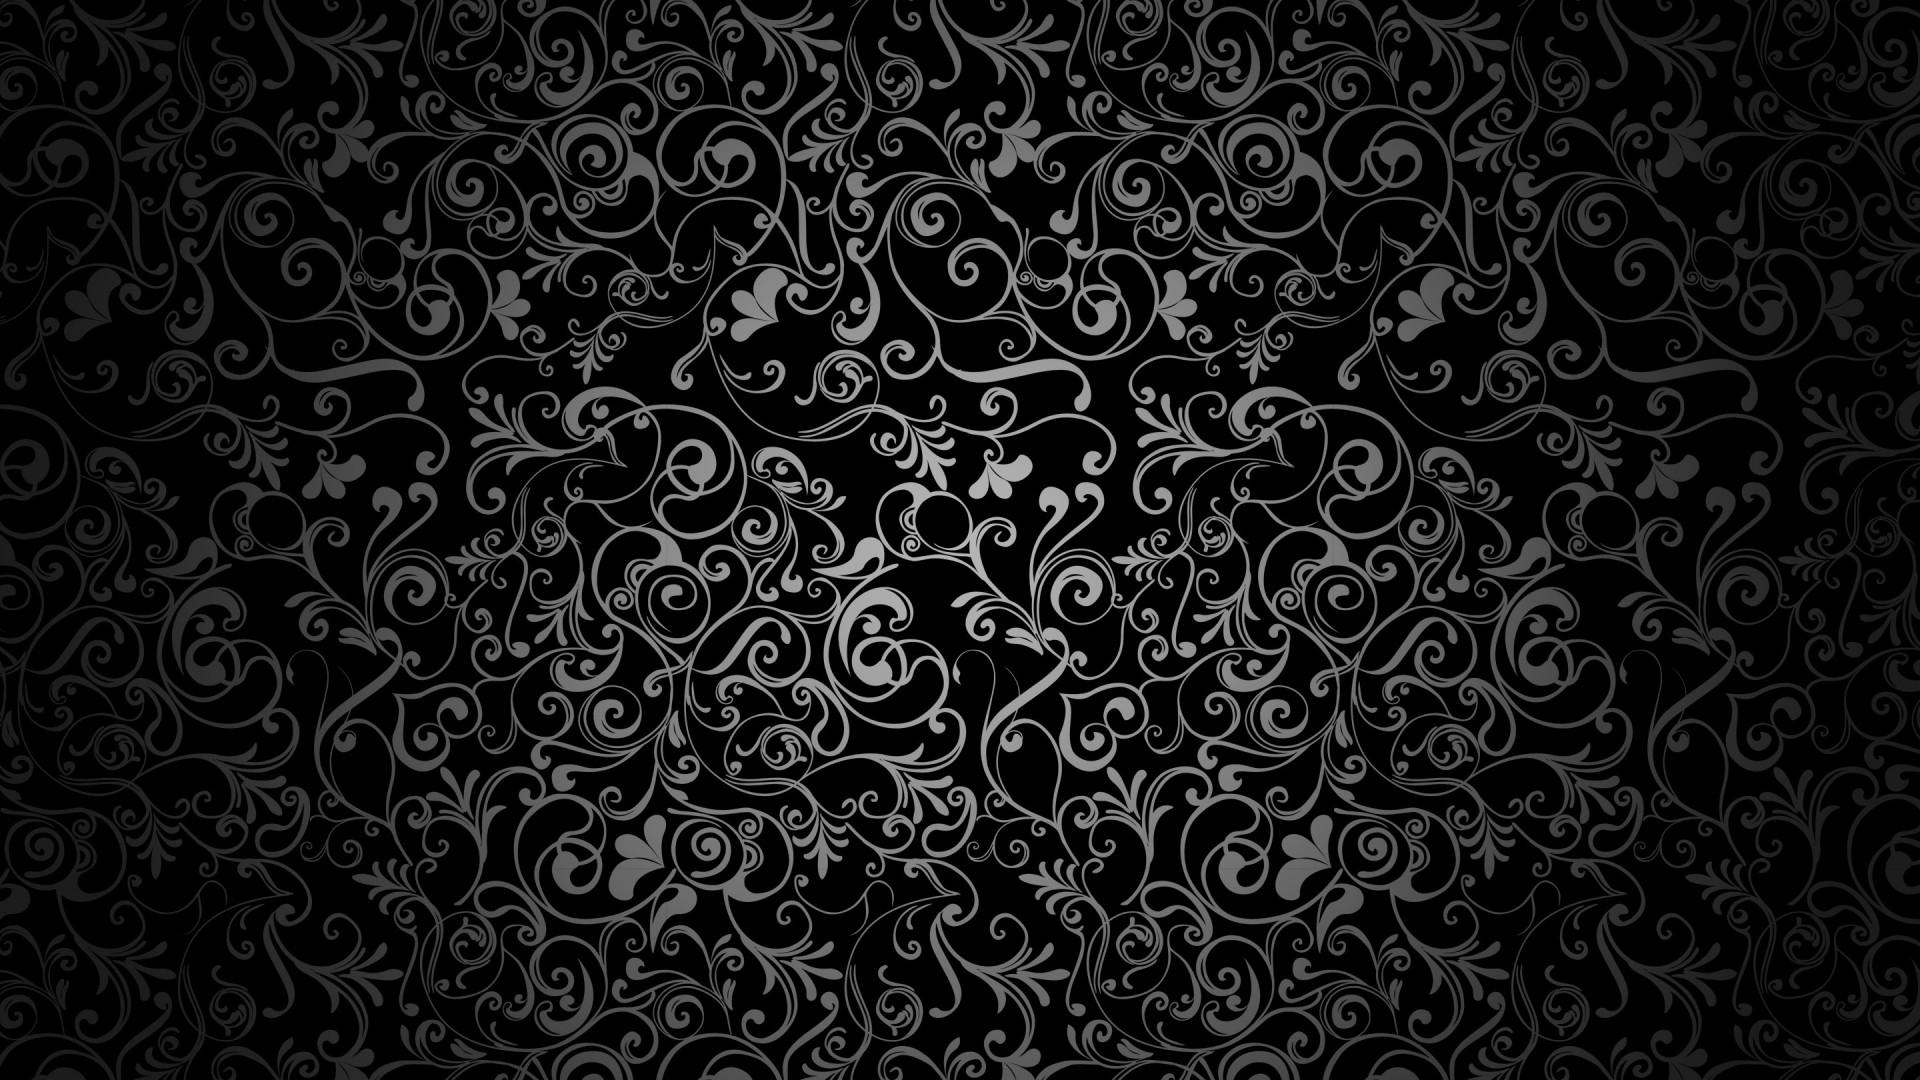 Black And White Floral Desktop Wallpaper